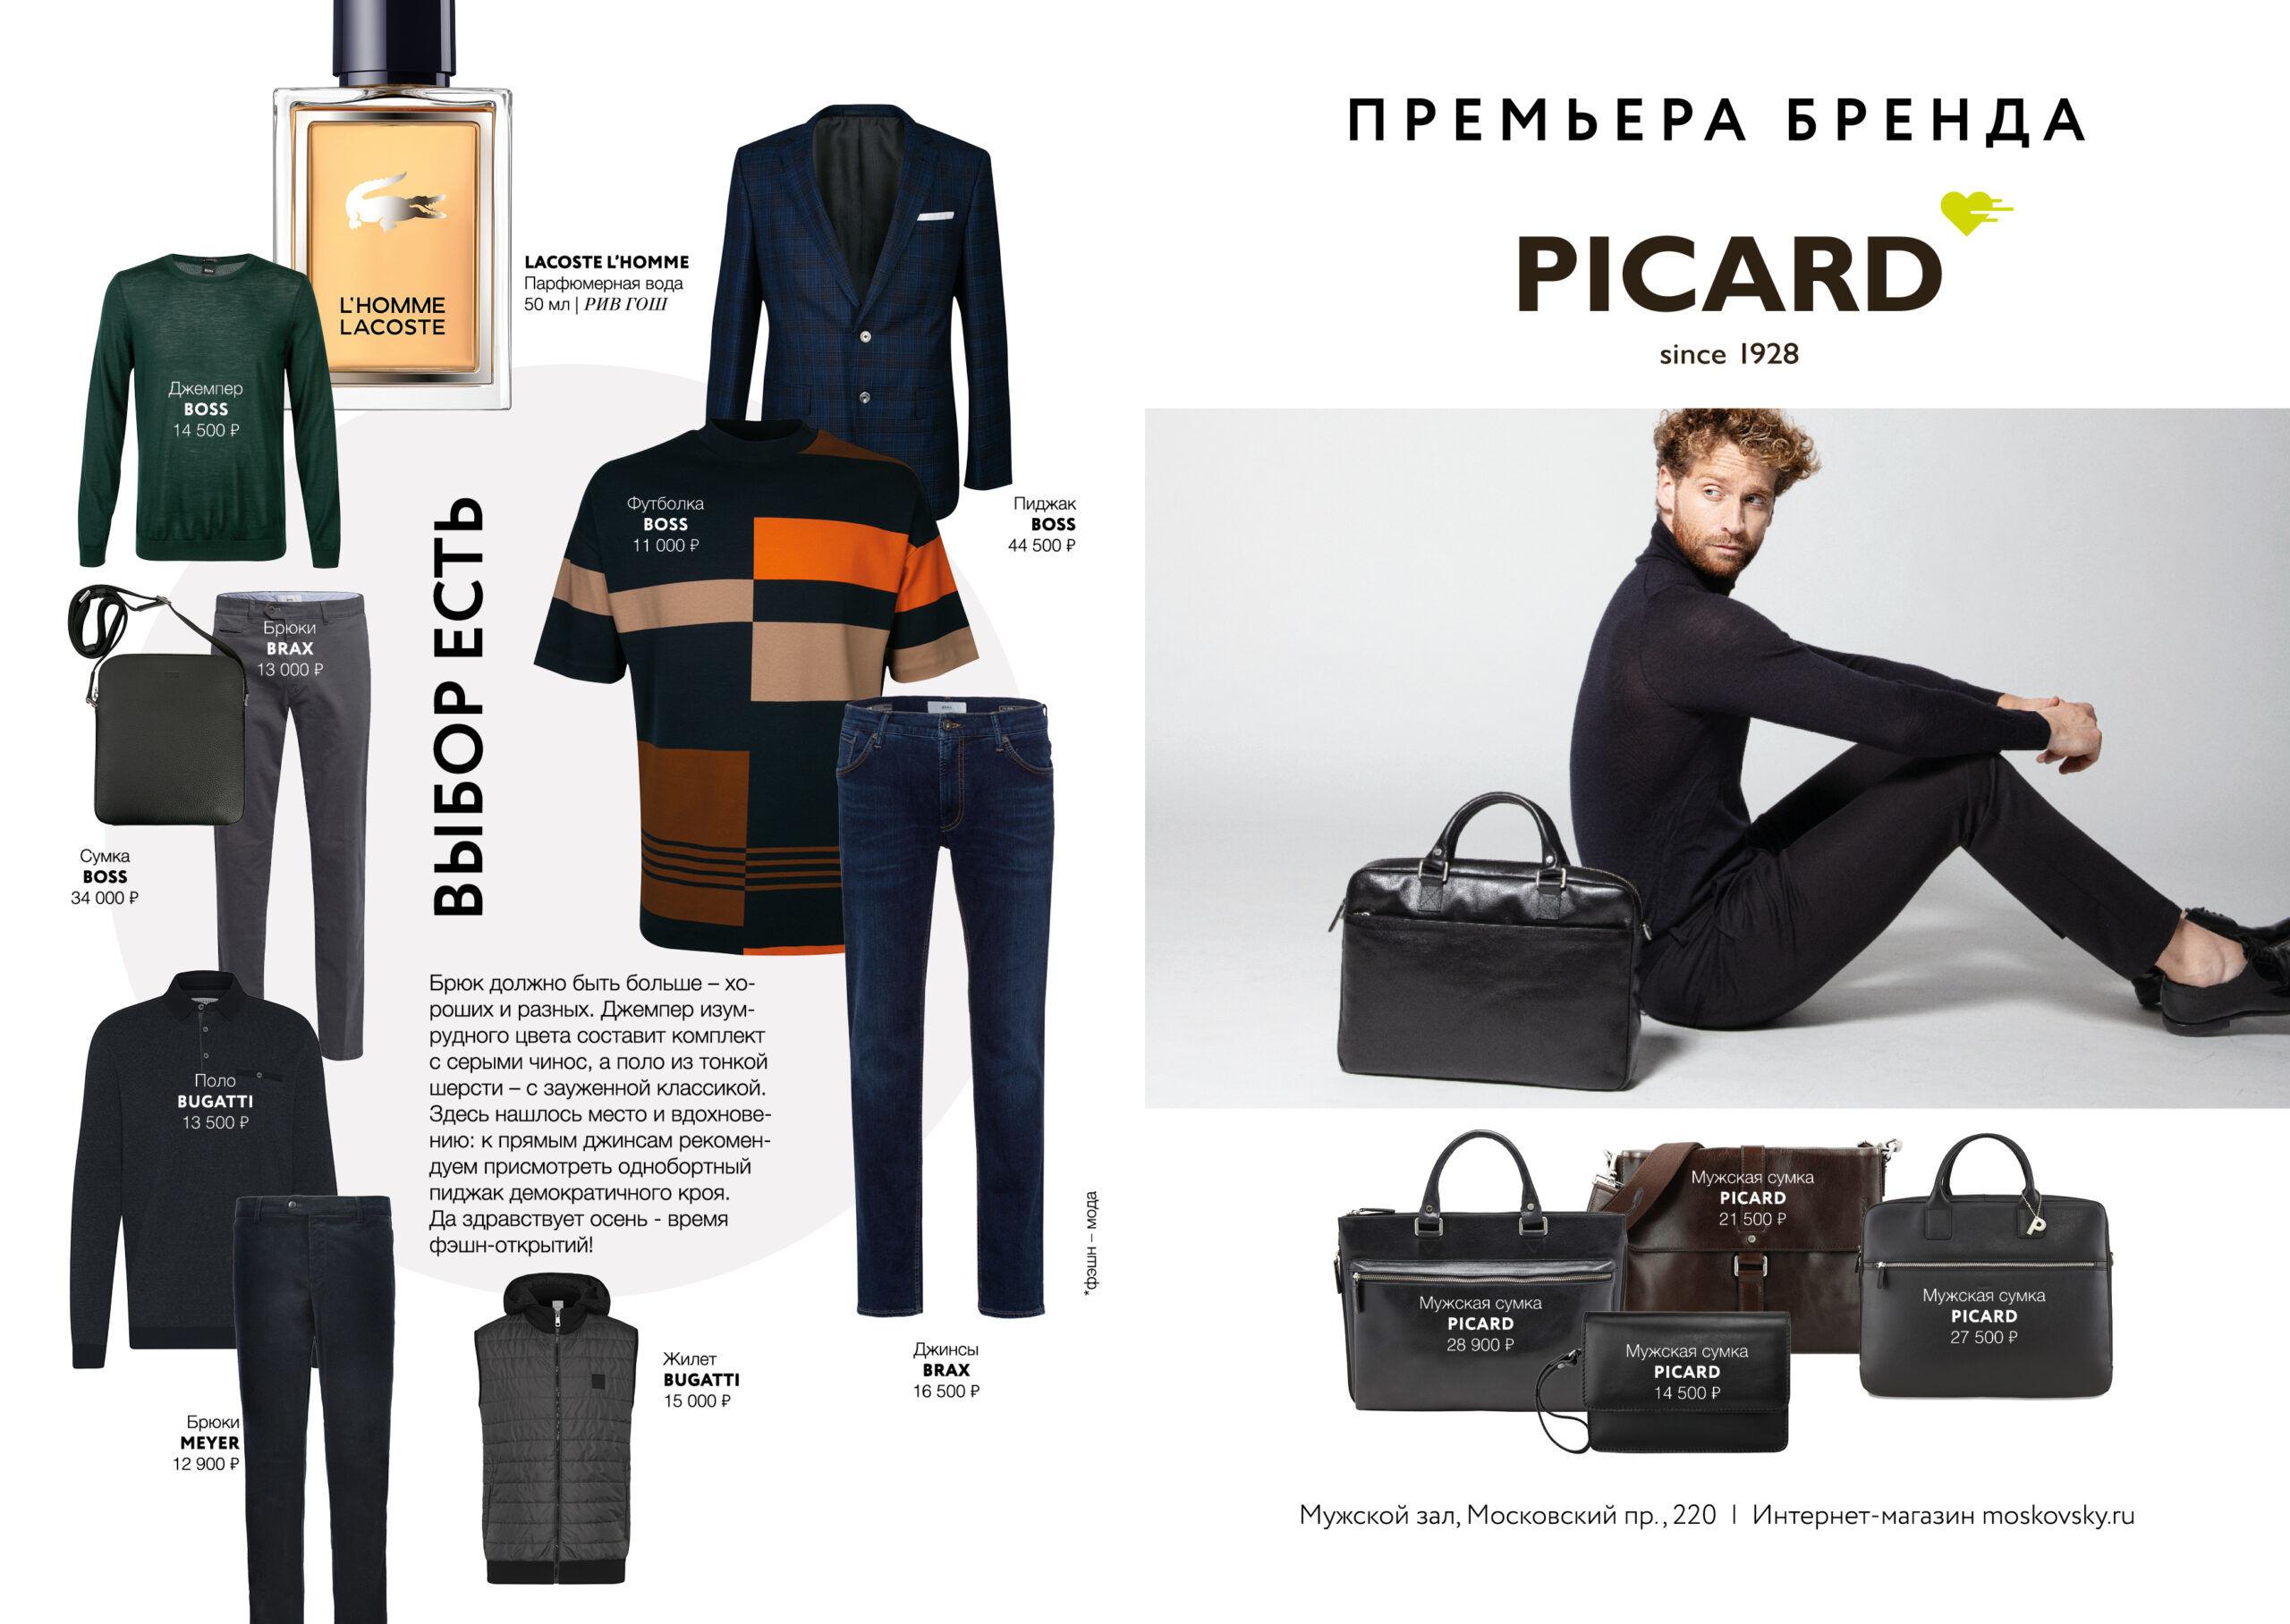 Московский каталог fw21-22_a5_МУЖ8